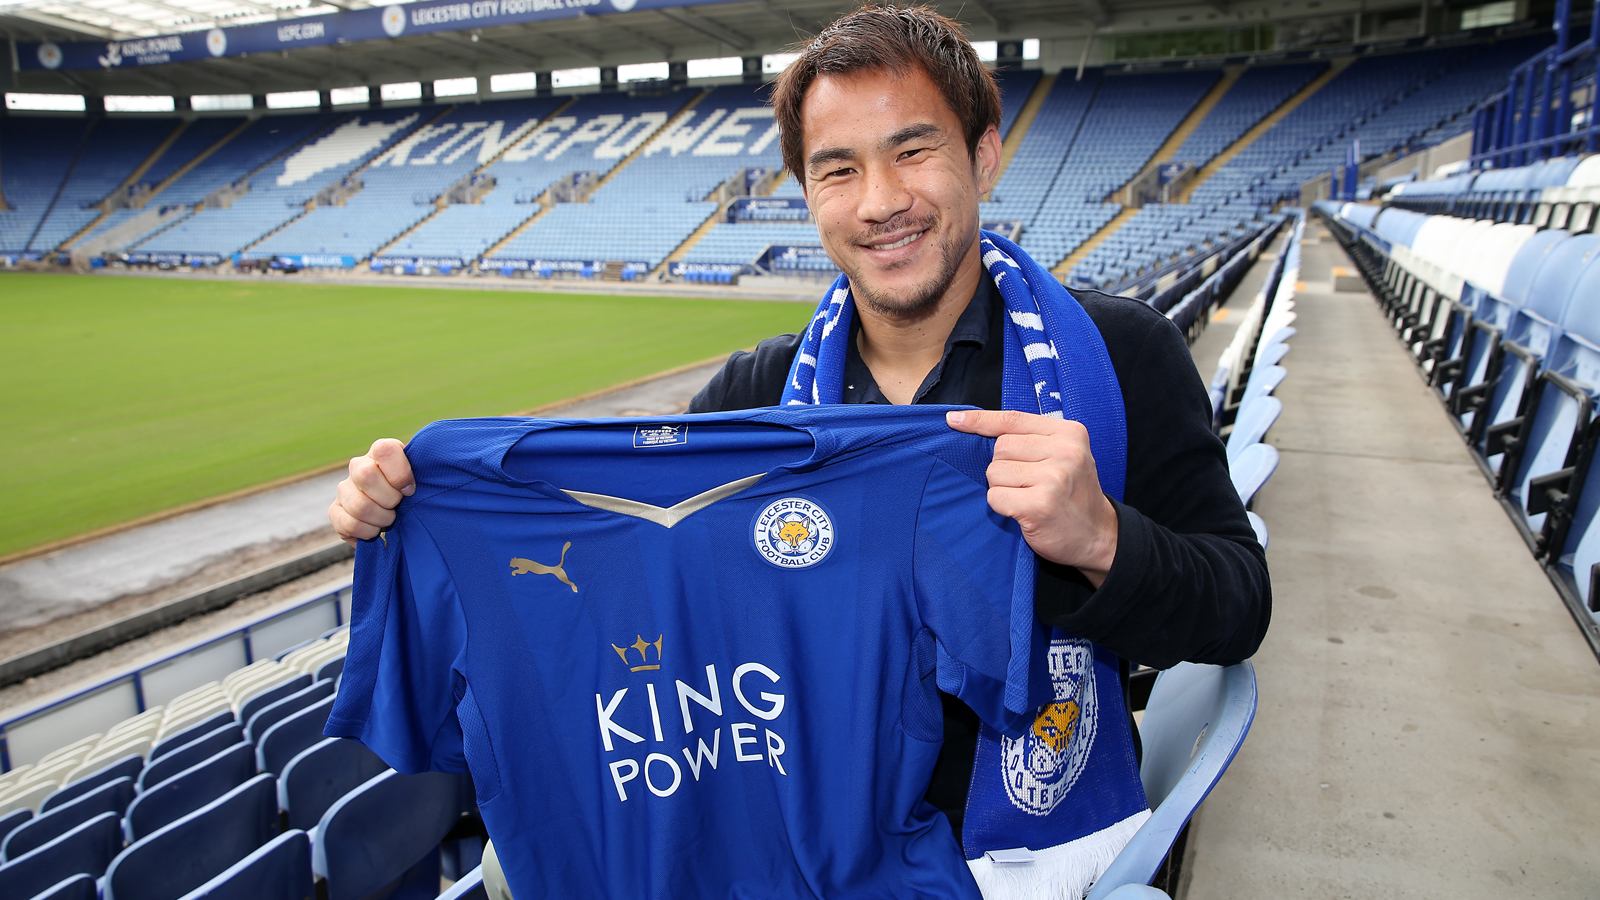 King Power Group | Leicester City F.C. Thailand Campaign- Shinji Okazaki